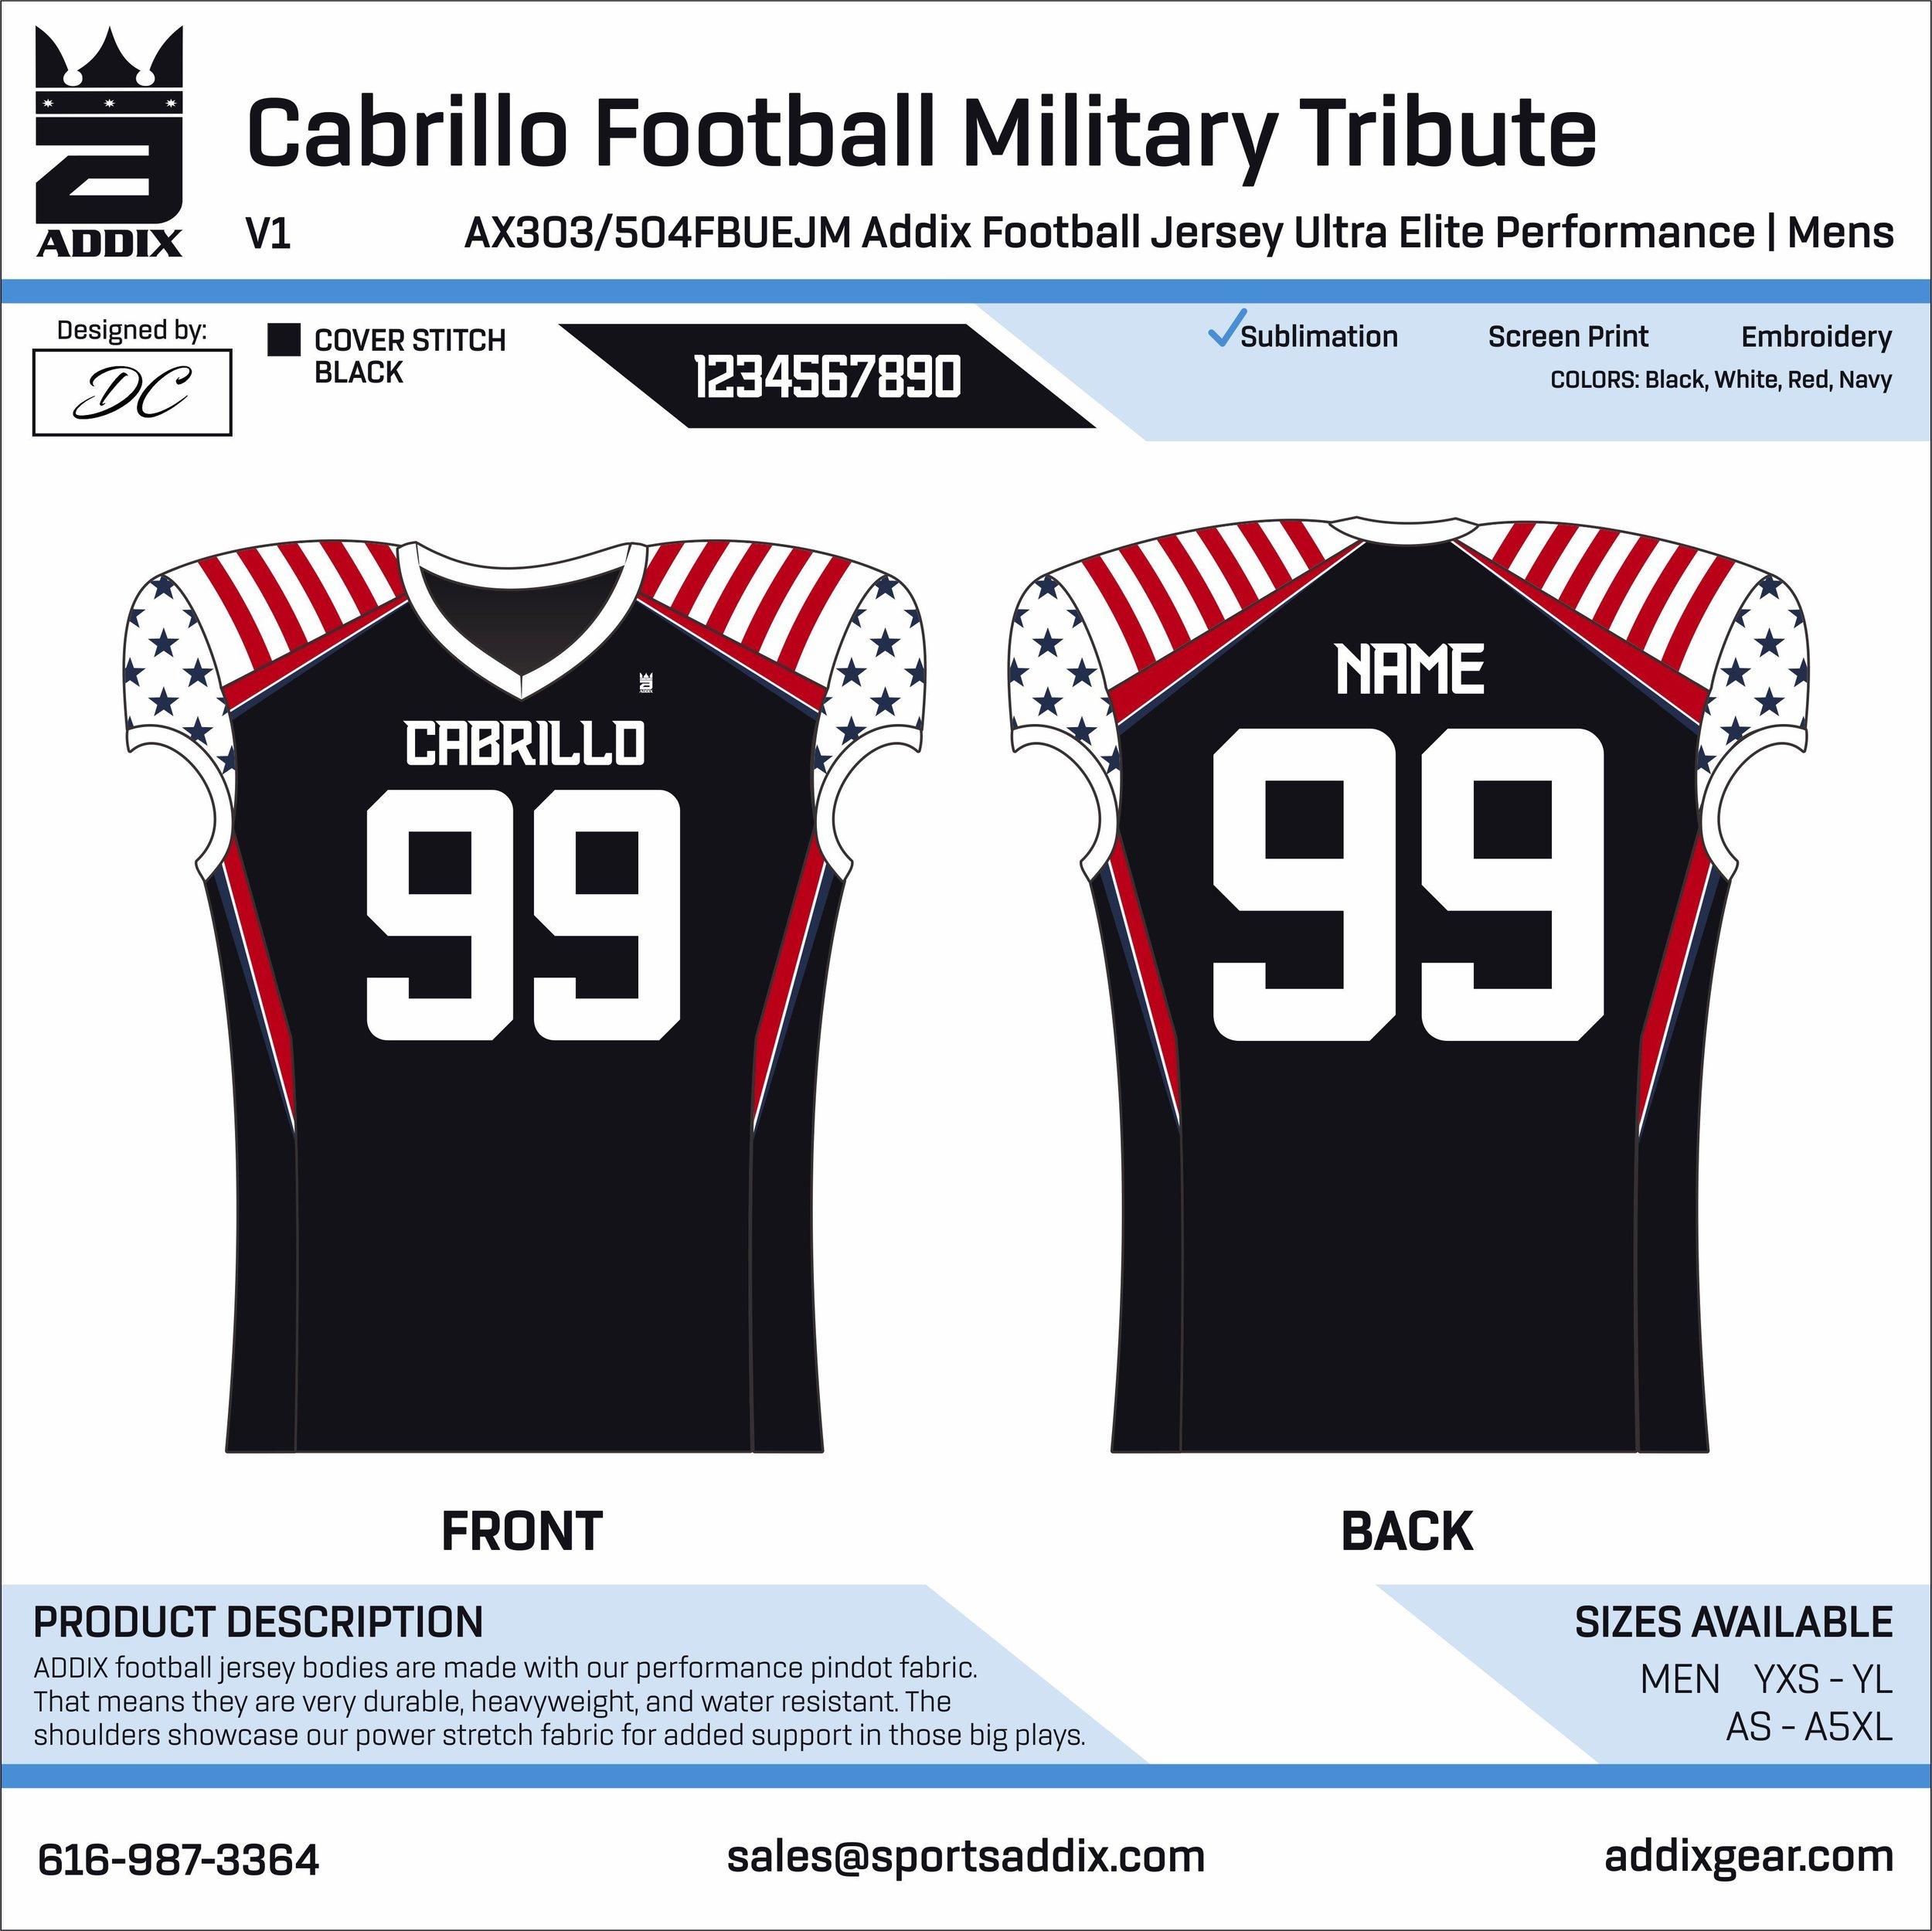 Cabrillo Football Military Tribute_2019_8-14_DC_UEP Jersey.jpg